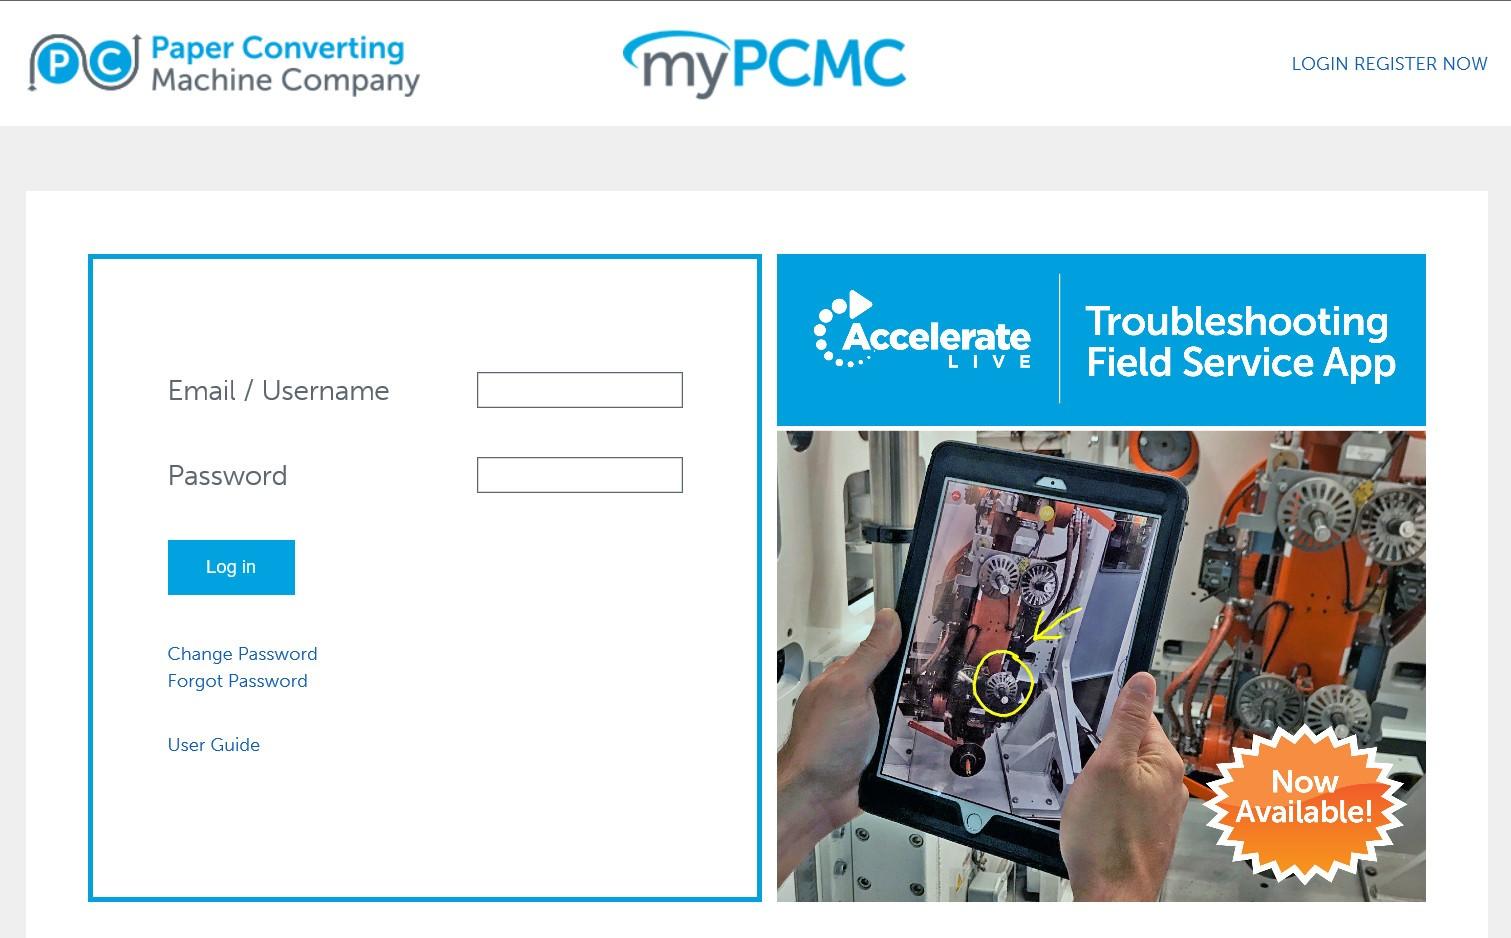 PR_PCMC_myPCMC_Photo_HighRes